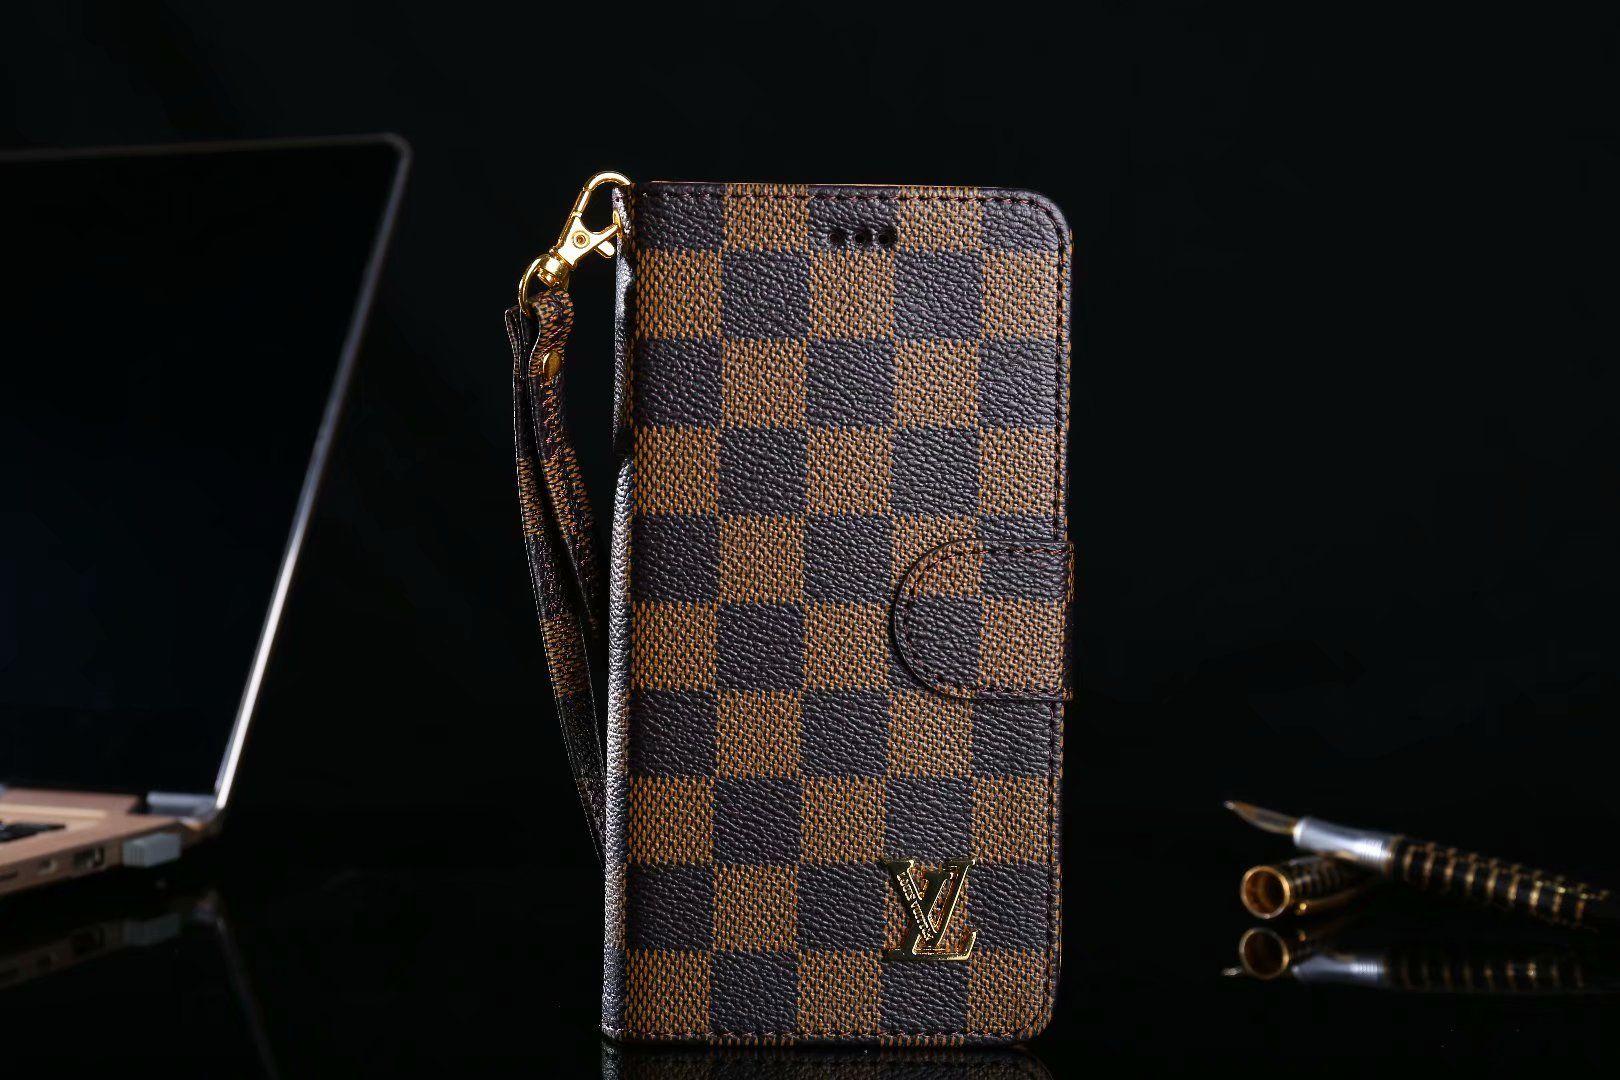 Iphone xsxrmax classic lv gucci folio phone case for